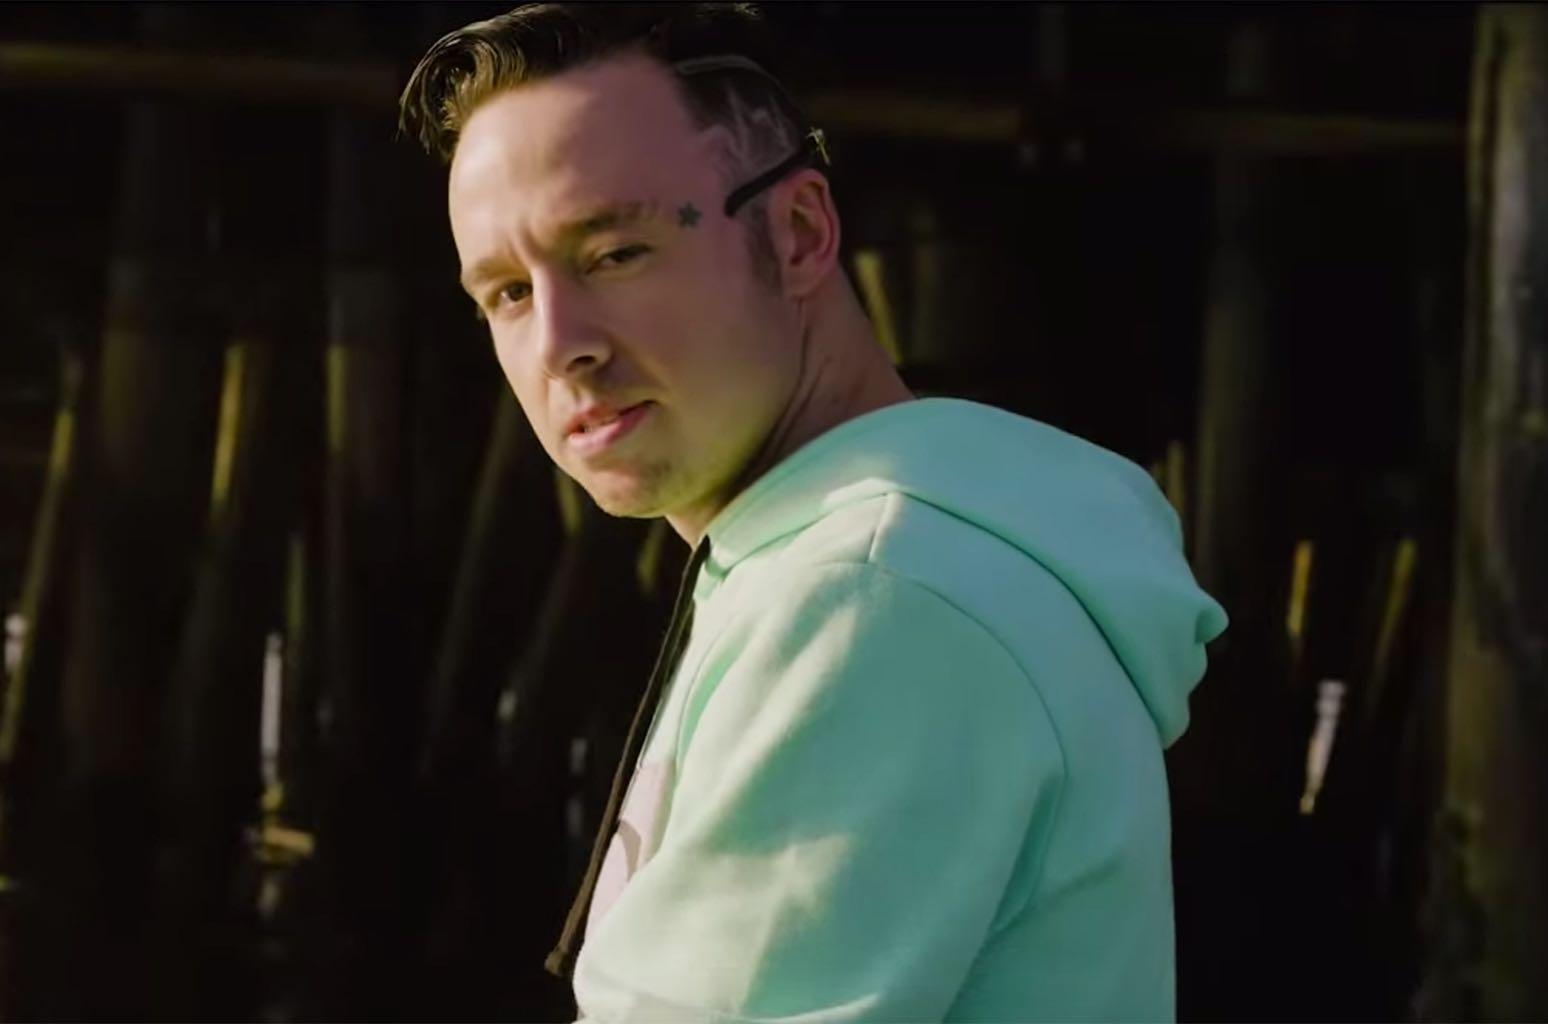 Jon James McMurray rapper Dies During Video Shoot, Report